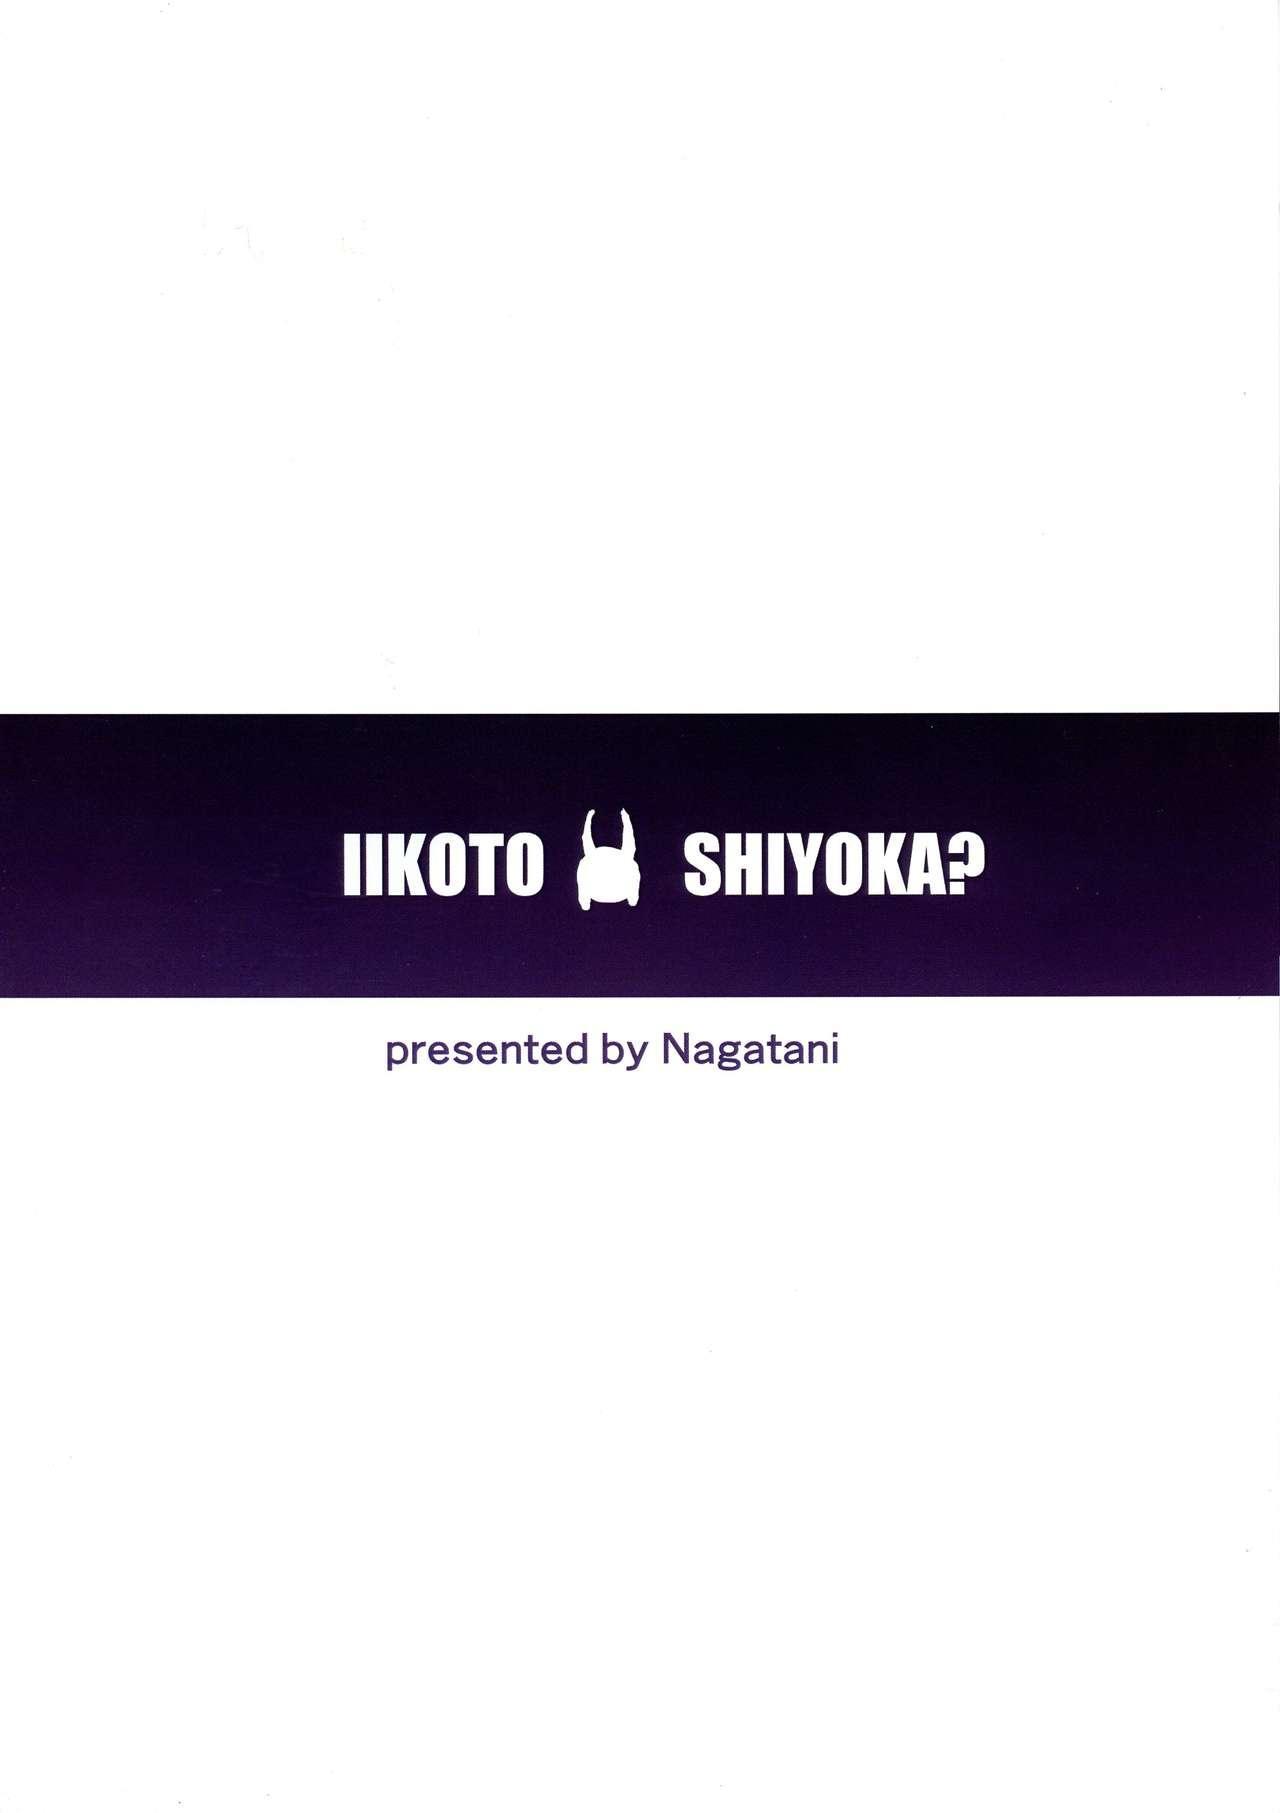 Iikoto Shiyo ka? | Can We Play Nice? 1